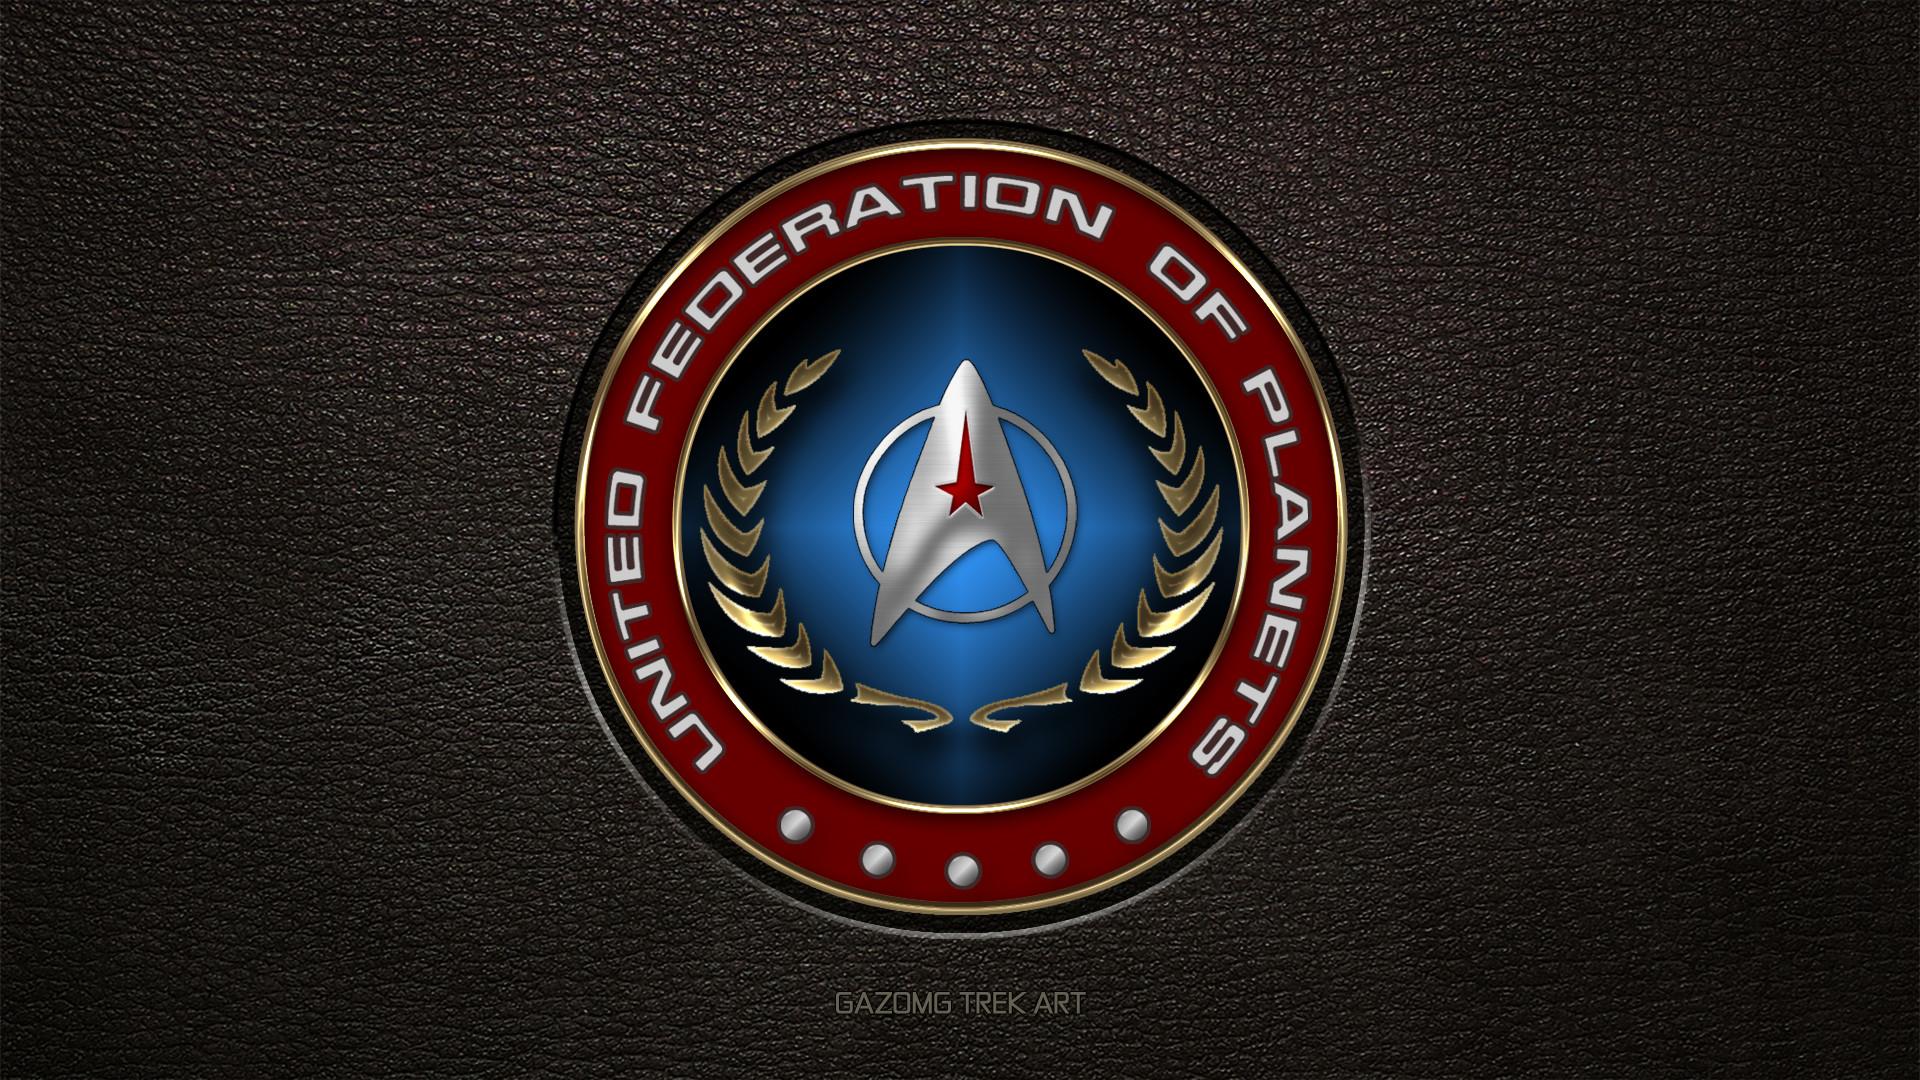 star trek starfleet command wallpaper - photo #19